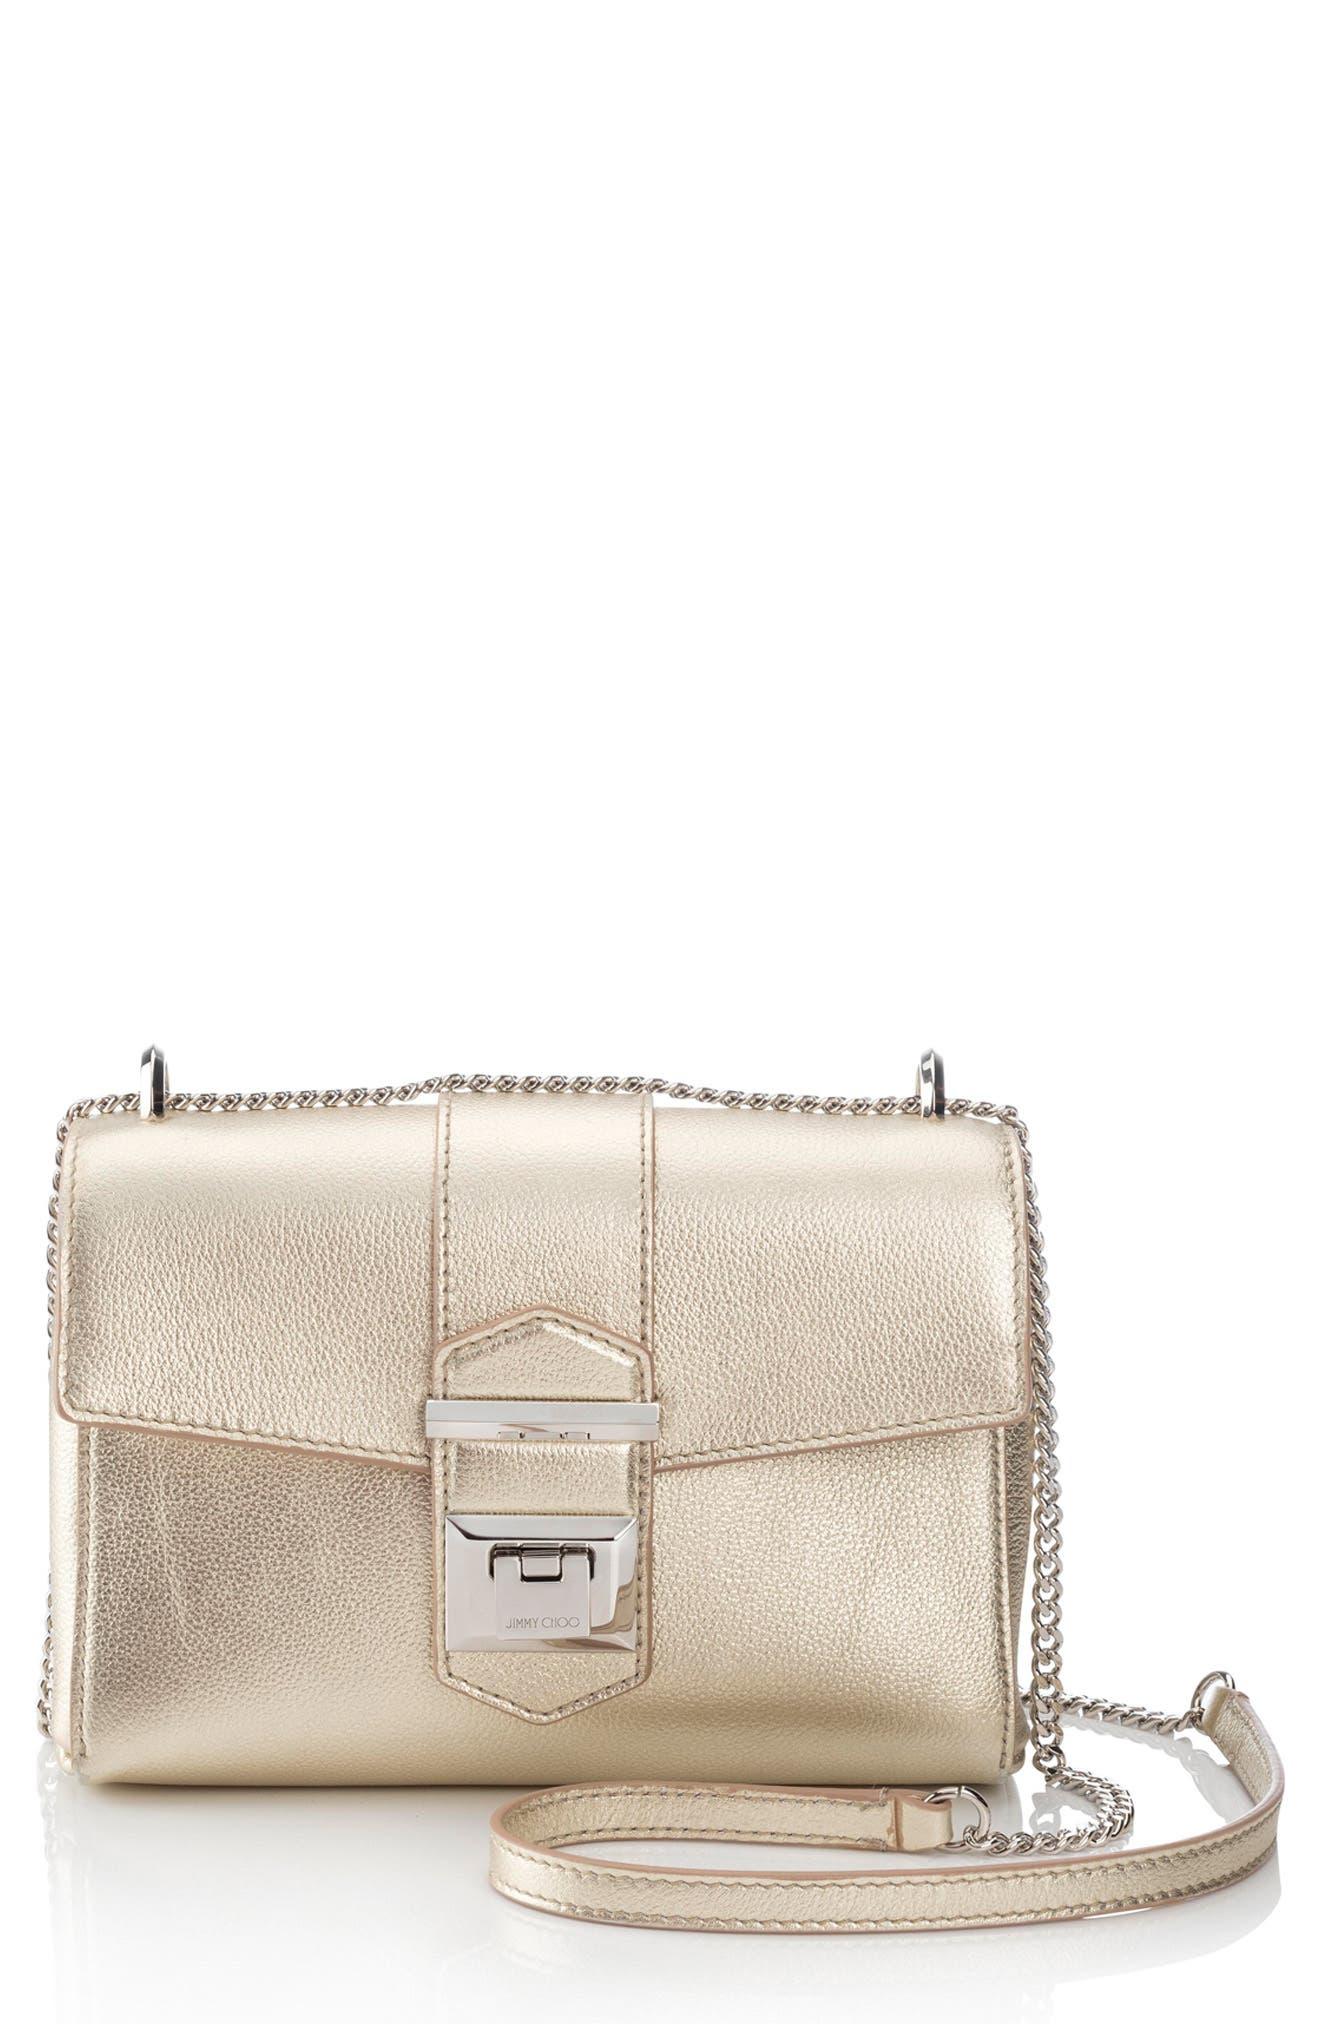 Marianne Metallic Leather Crossbody Bag,                             Main thumbnail 1, color,                             GOLD